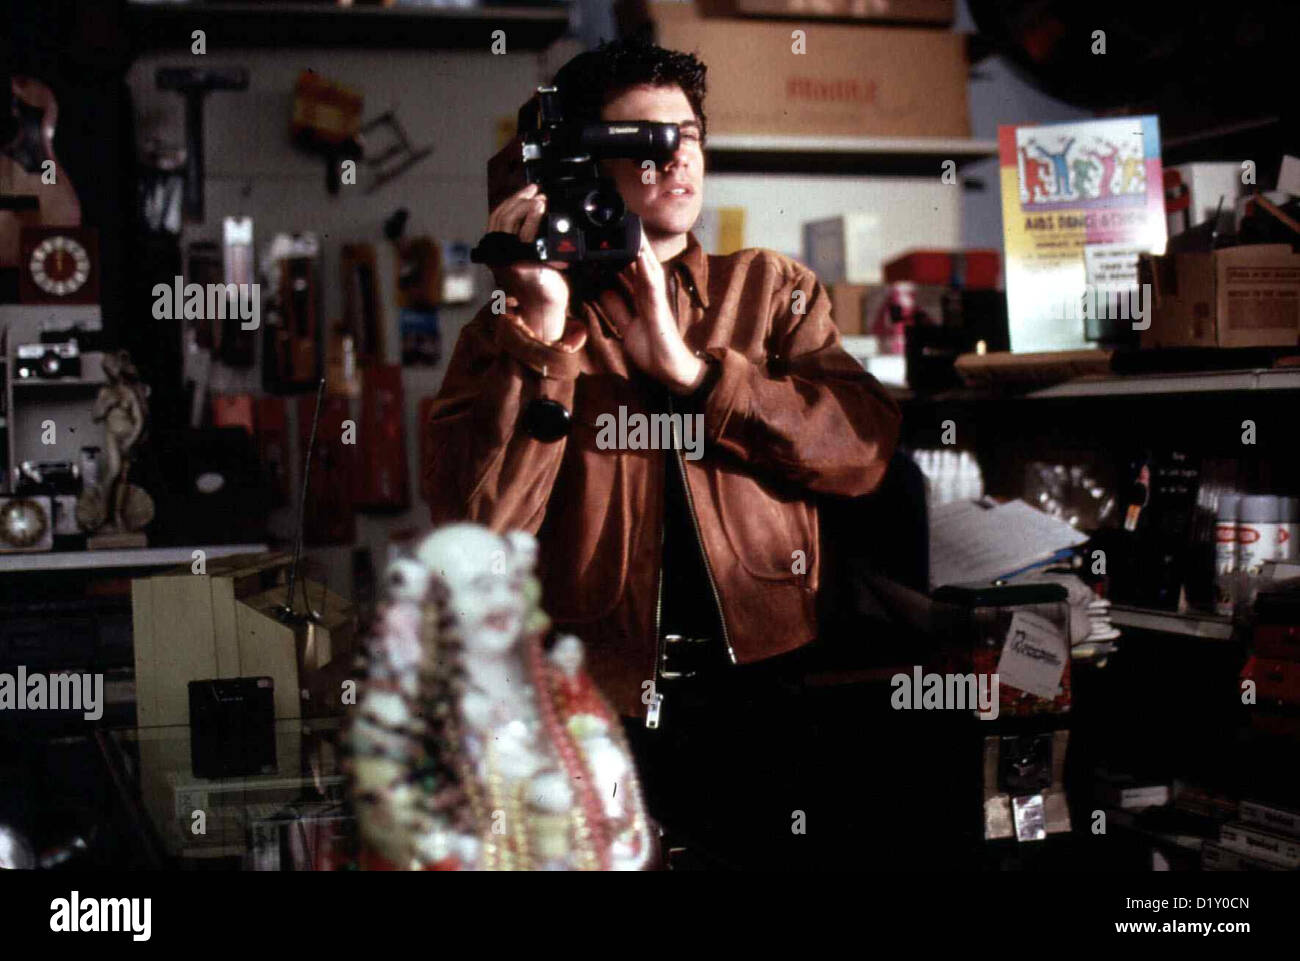 watch invasion of privacy 1992 movie online